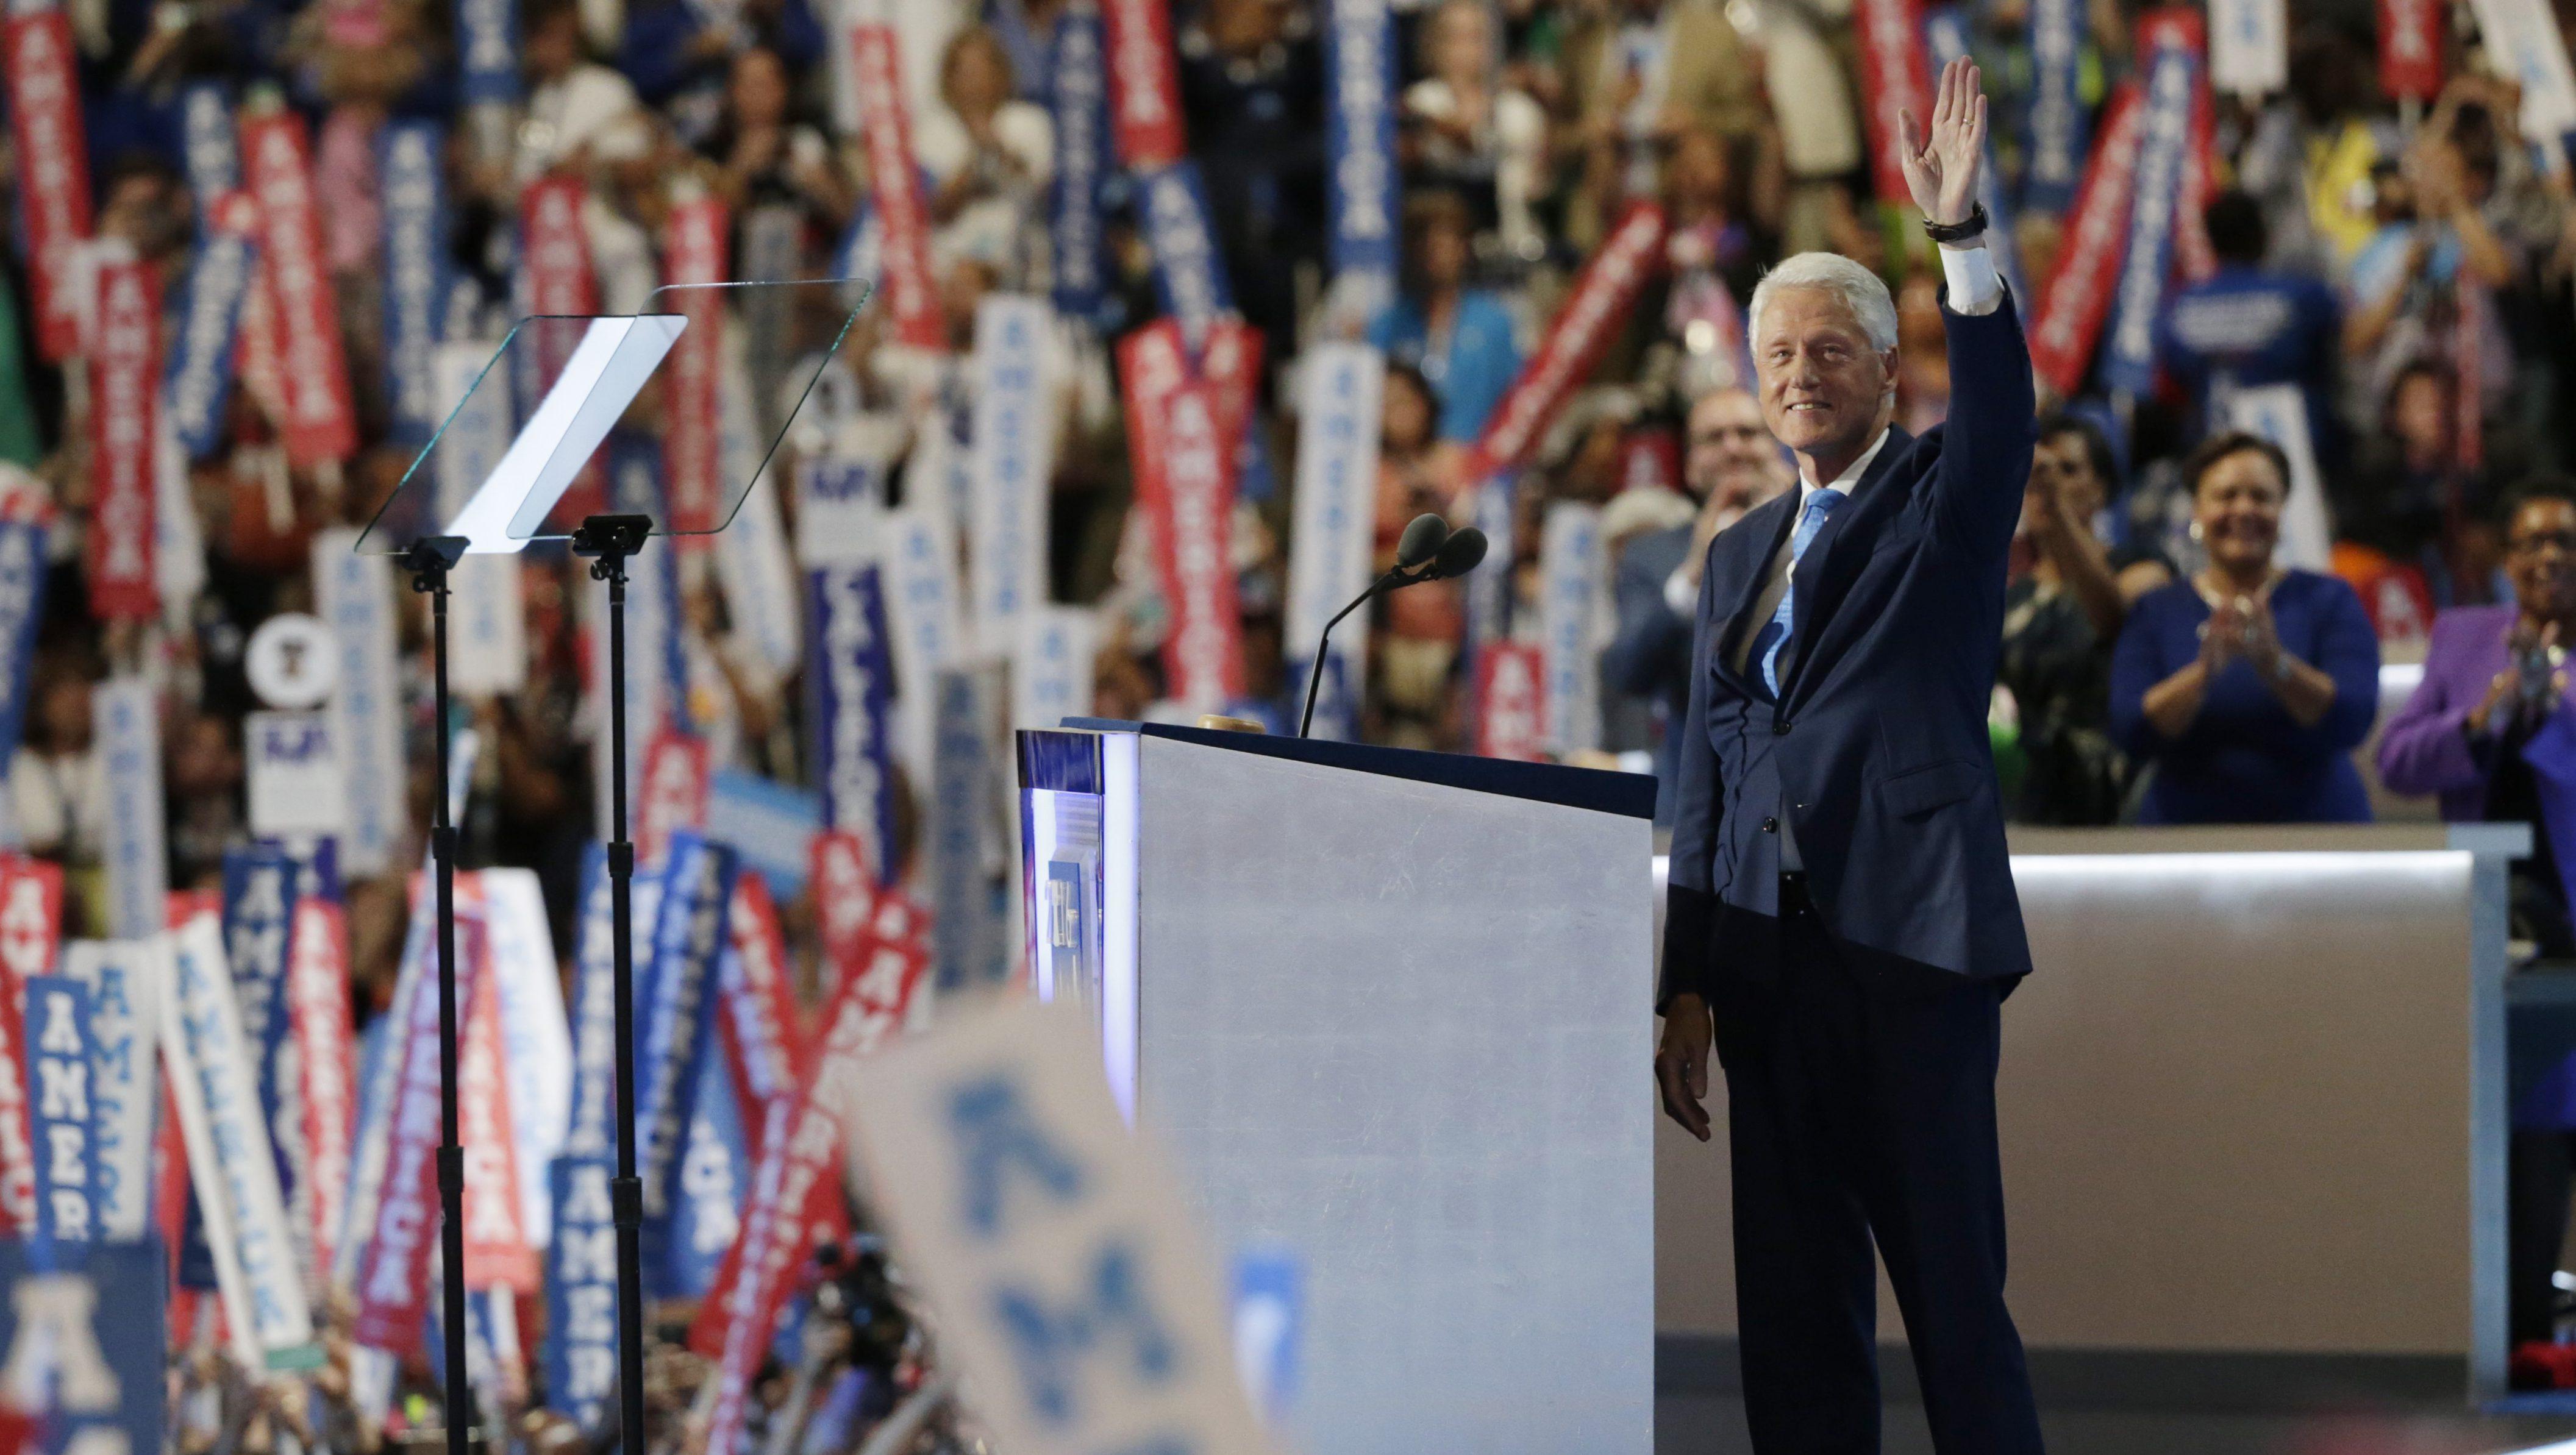 Bill Clinton at DNC 2016